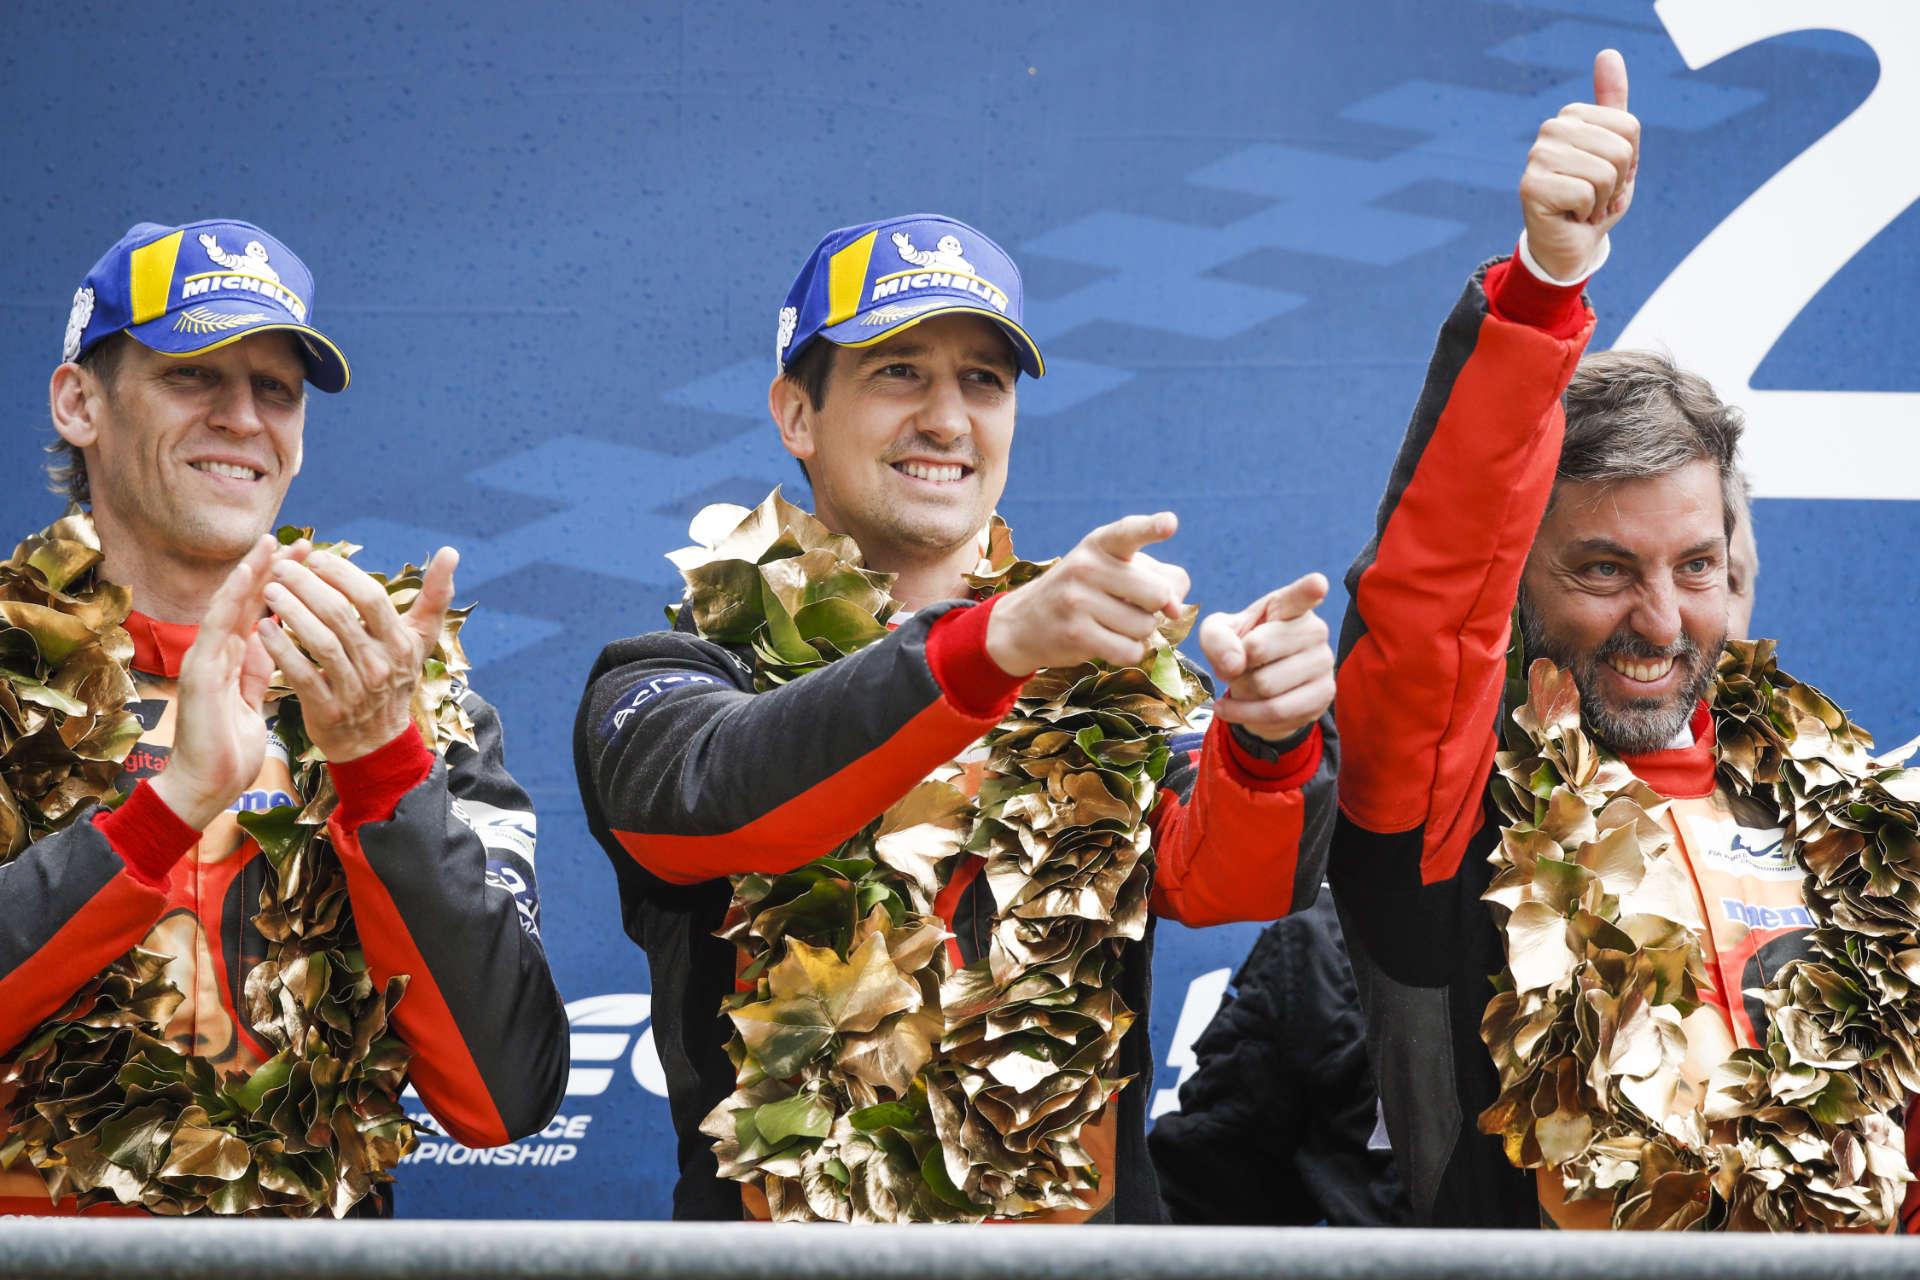 Jörg Bergmeister, Patrick Lindsey und Egidio Perfetti in Le Mans 2019